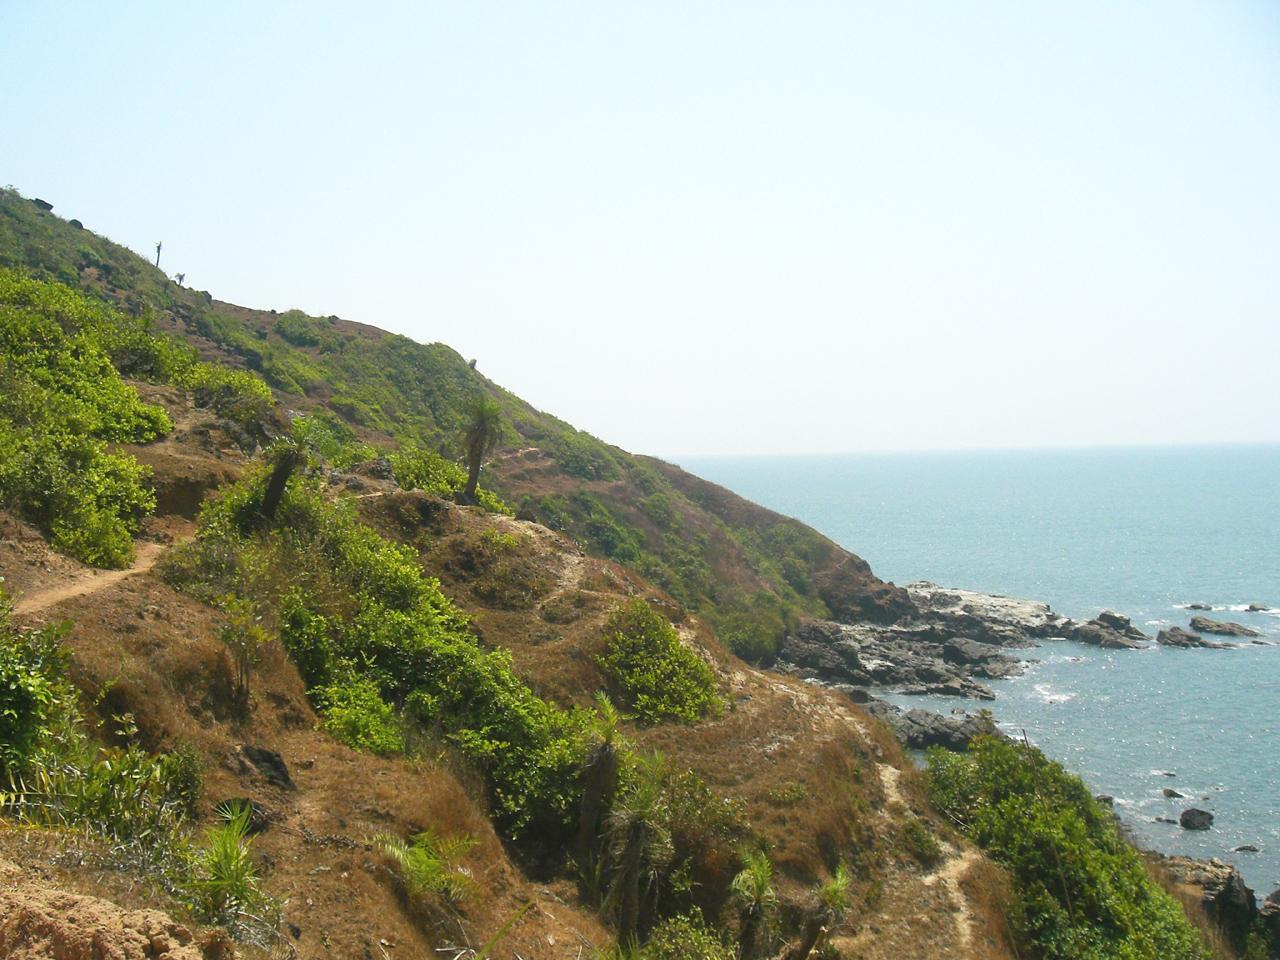 Altinho Hill